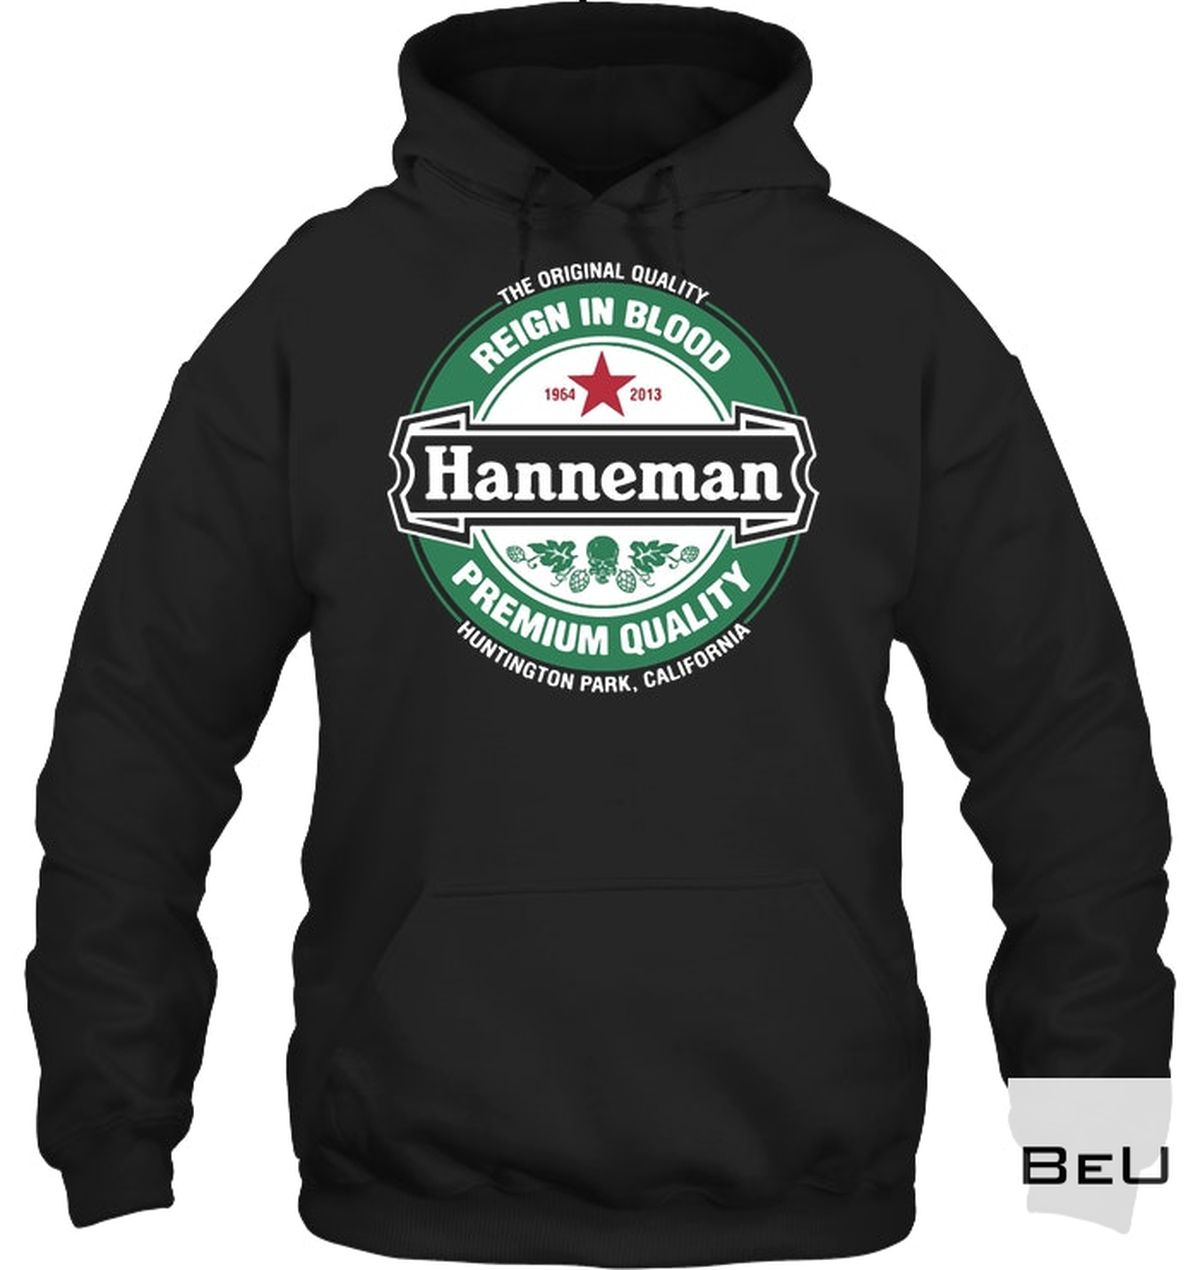 Free The Original Quality Reign In Blood Hanneman Shirt, Hoodie, Tank Top